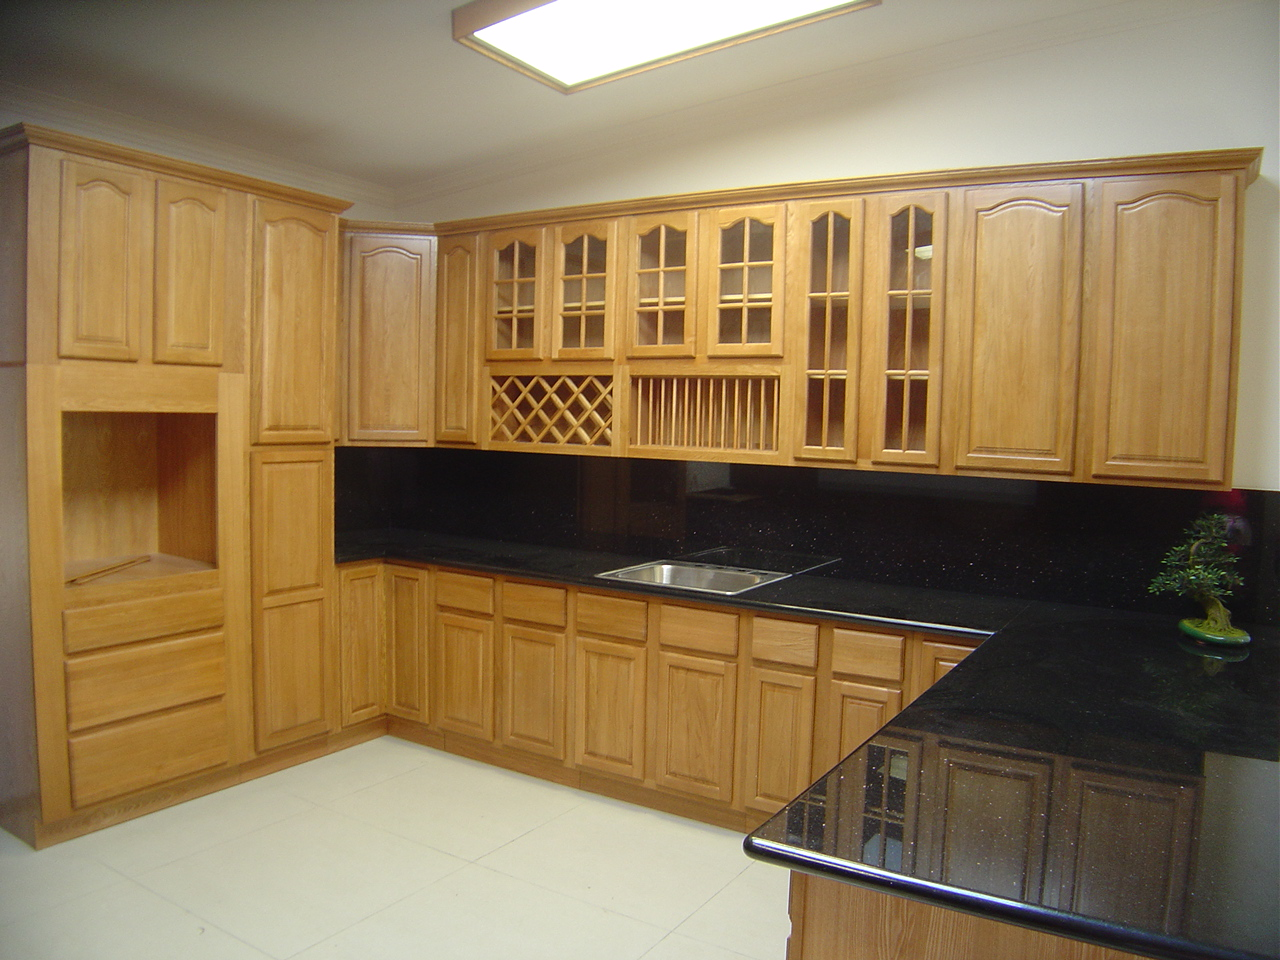 Kitchen pantry furniture photo - 1